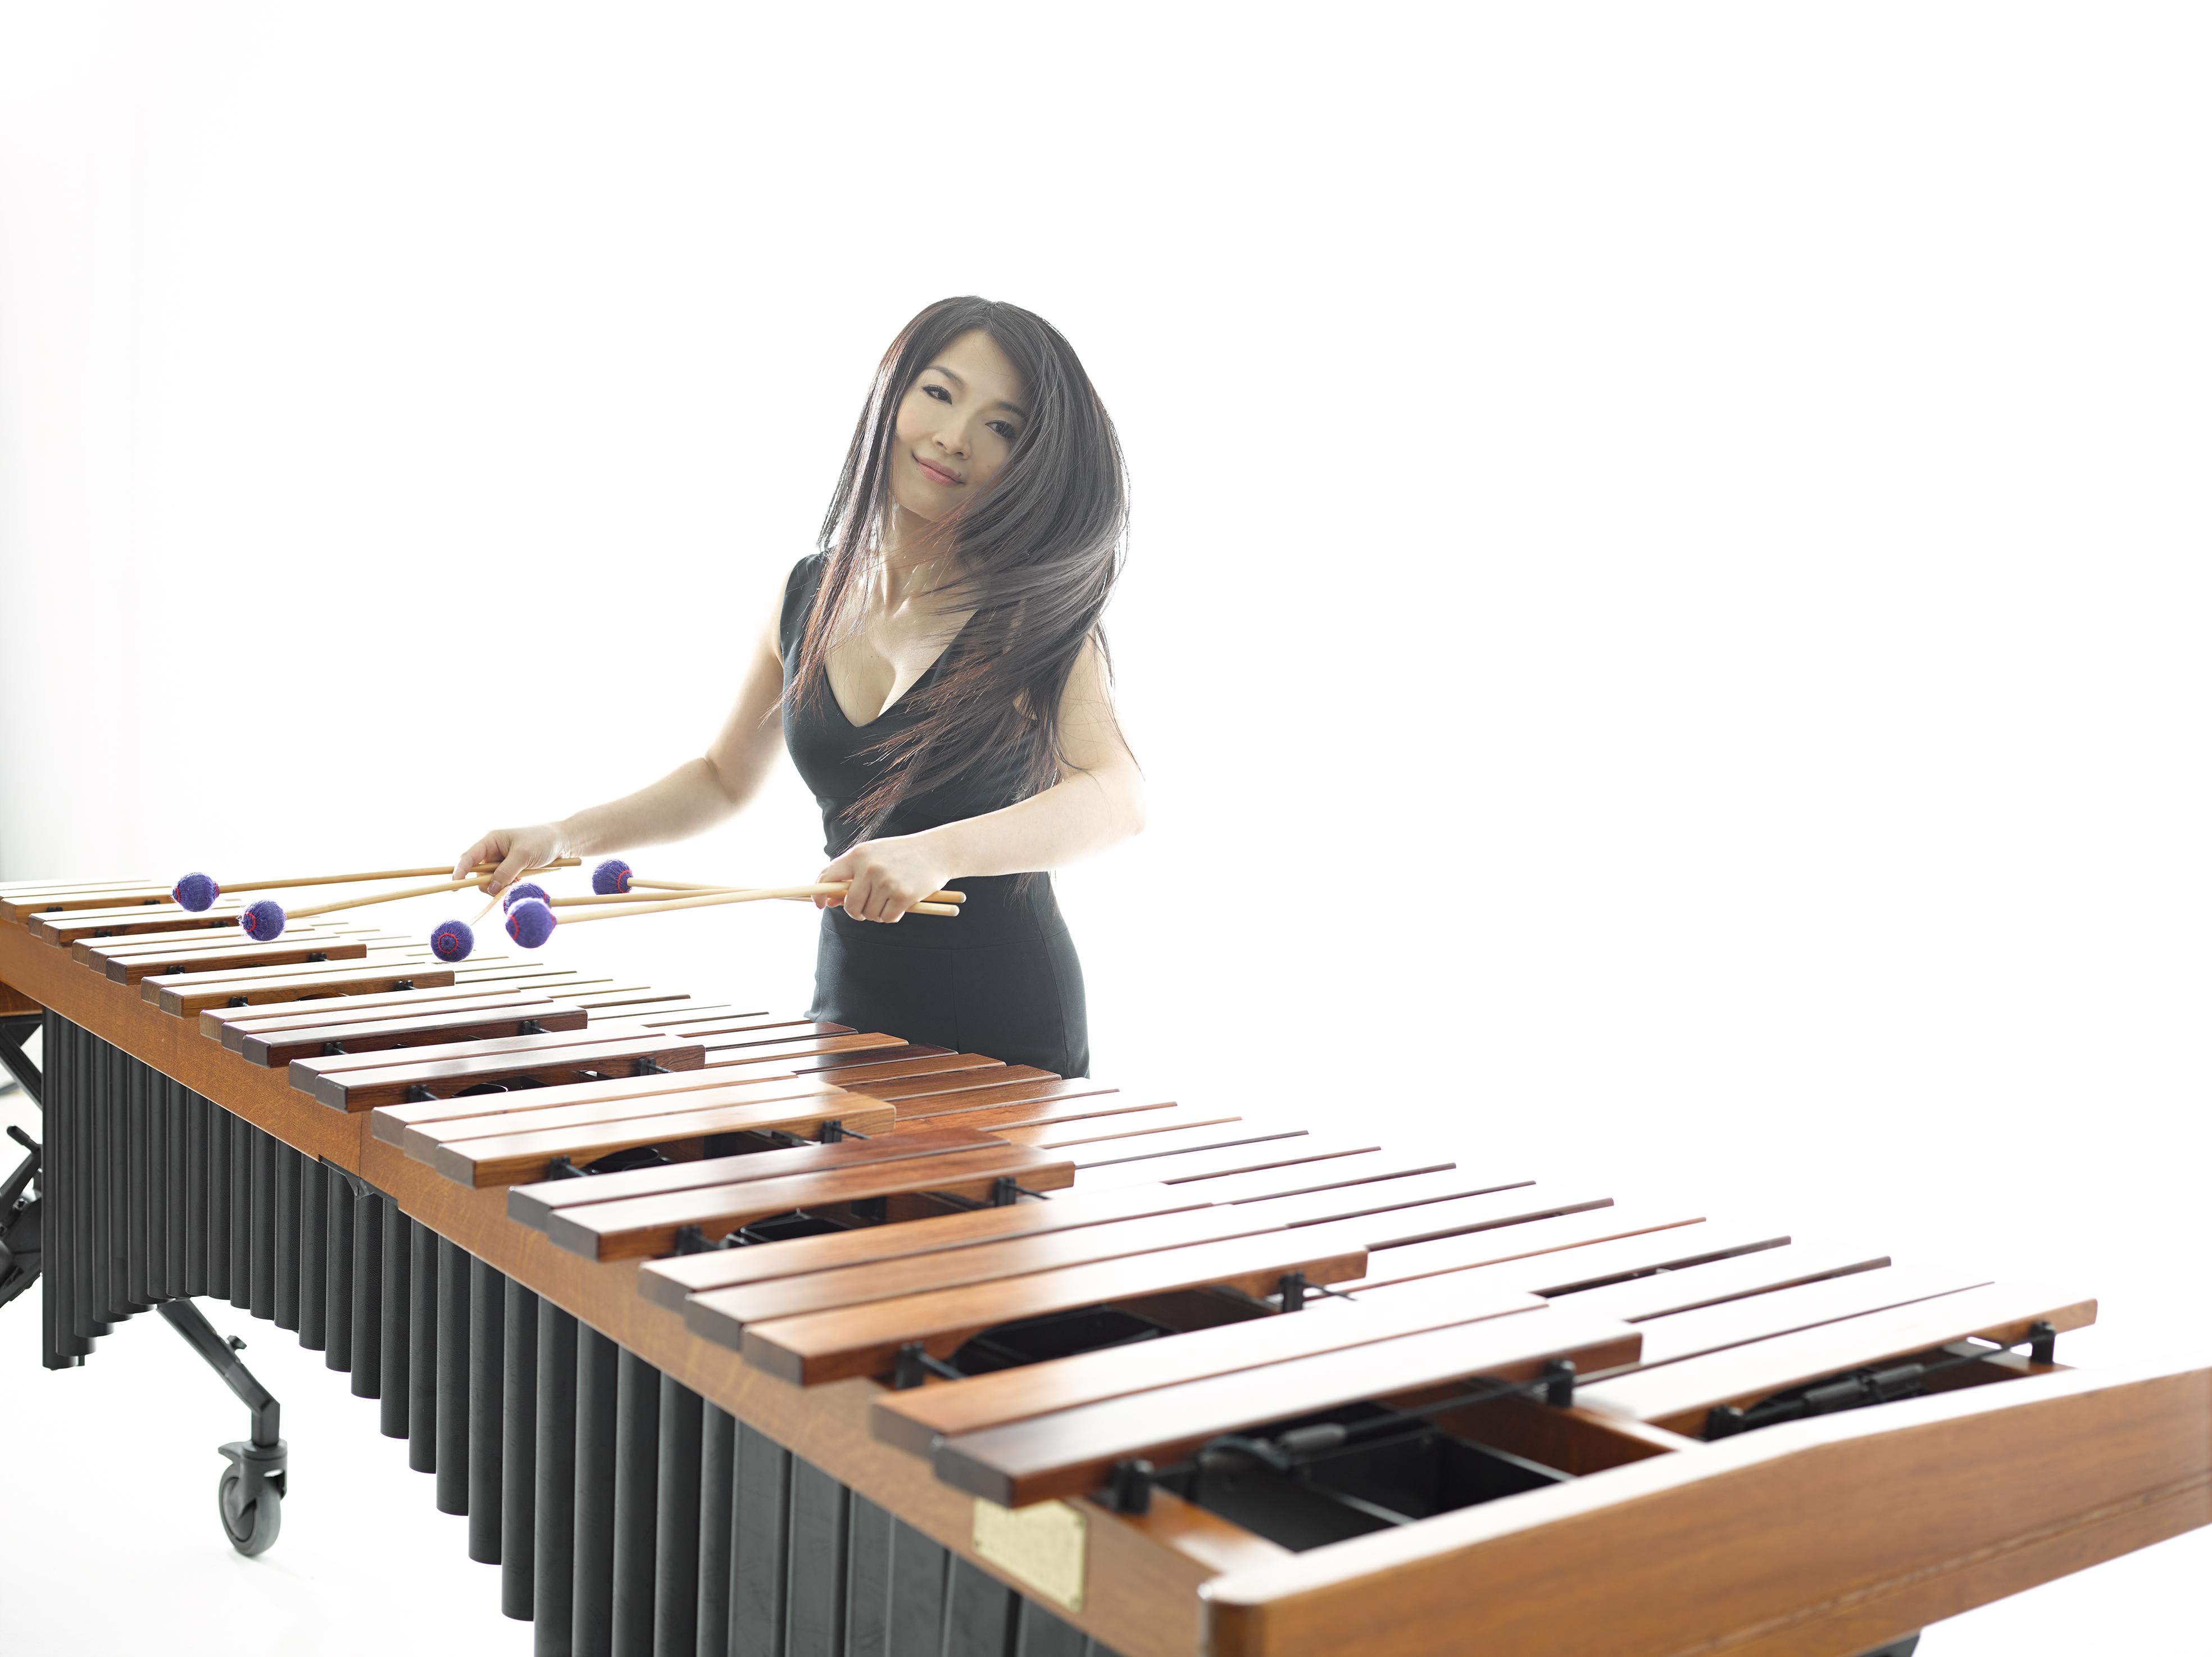 Pei-ching with marimba 2014